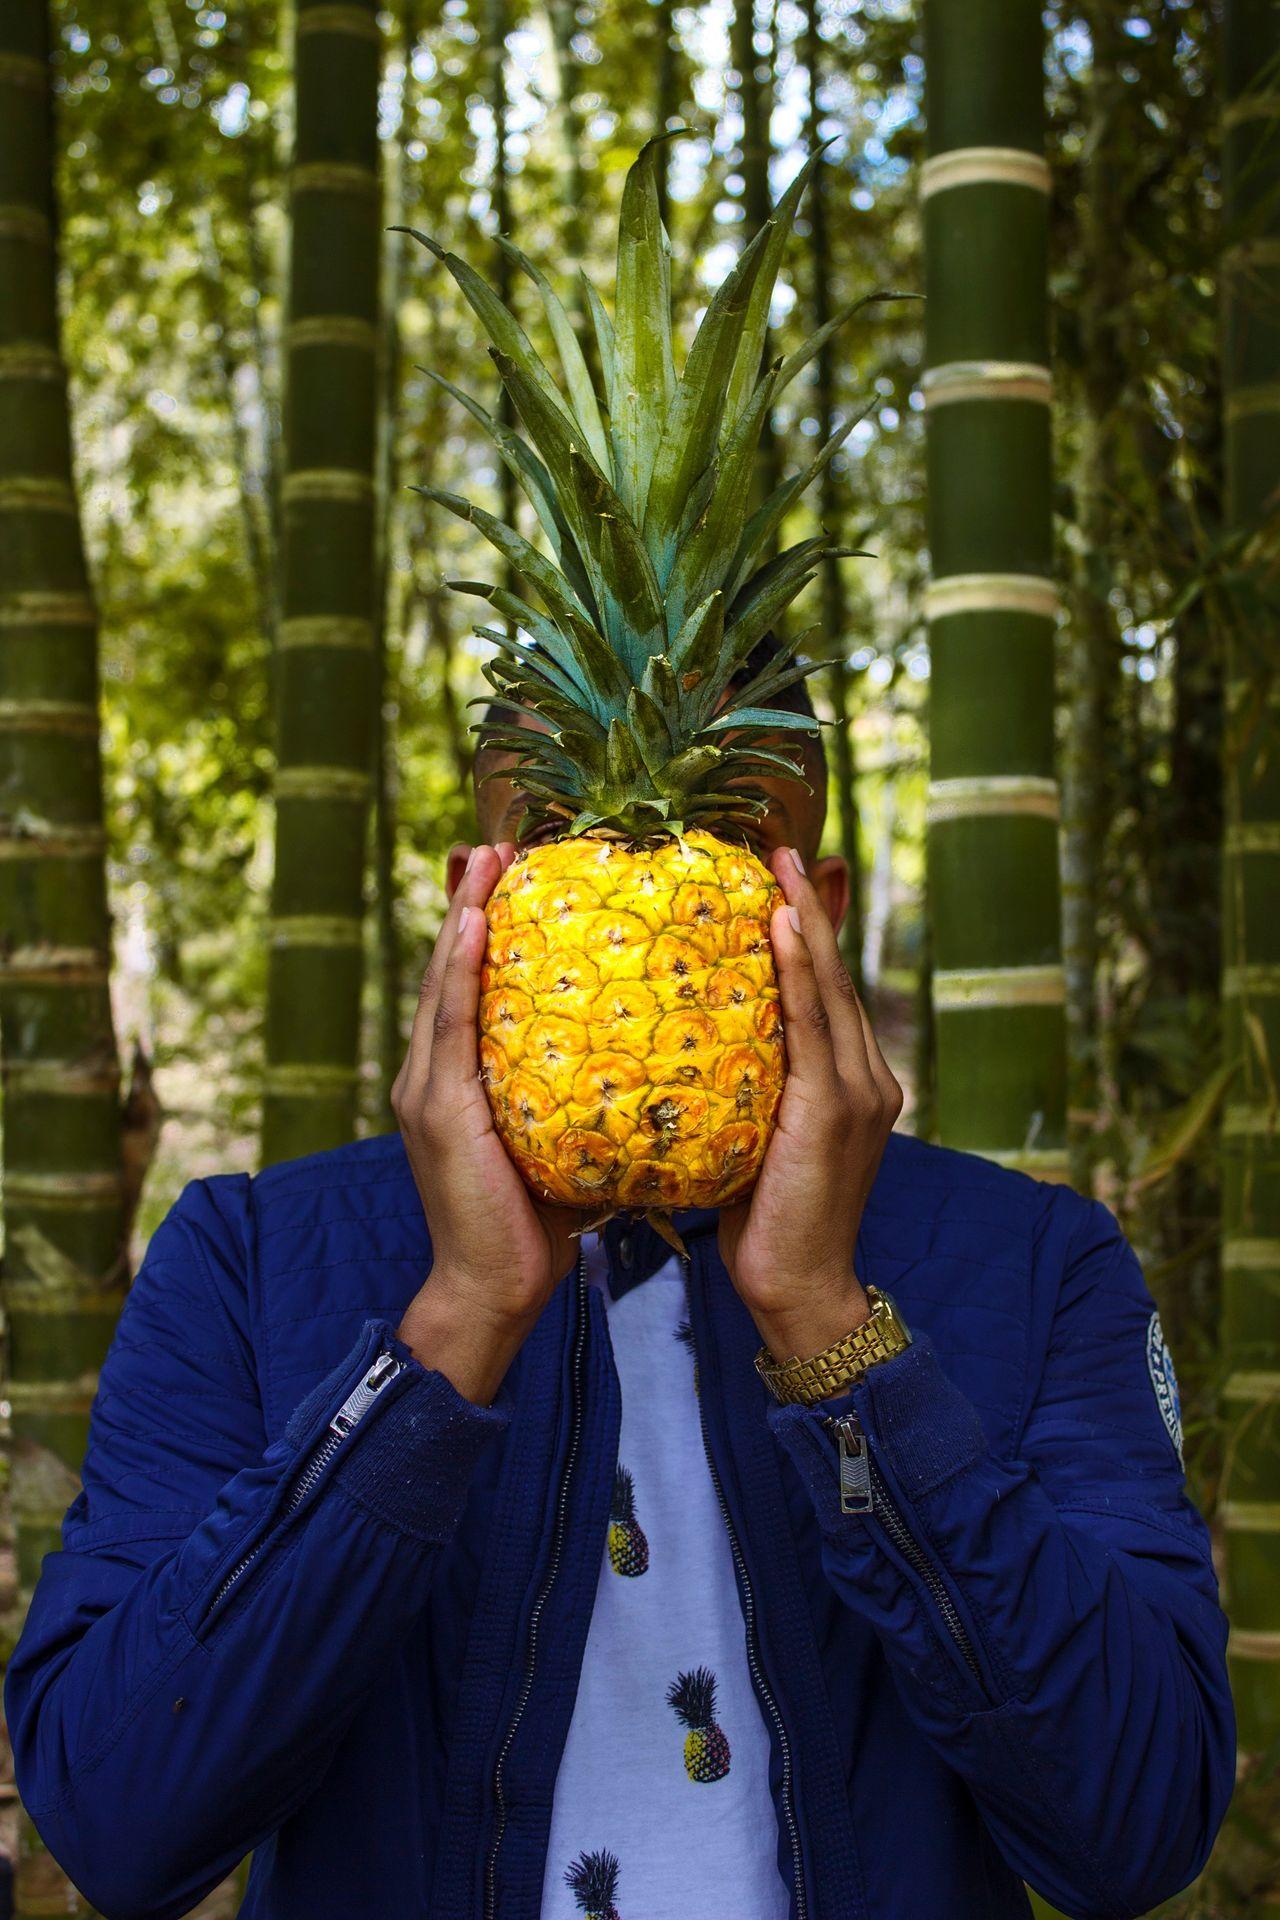 Naturaleza🌾🌿 Nature photography naturaleza Nature's Diversities Happy sheets🍃 amarillo yellow piña Pineapple verde Green color Green manos Hands azul blue chaqueta jacket reloj Cloock Fresh on Market 2017